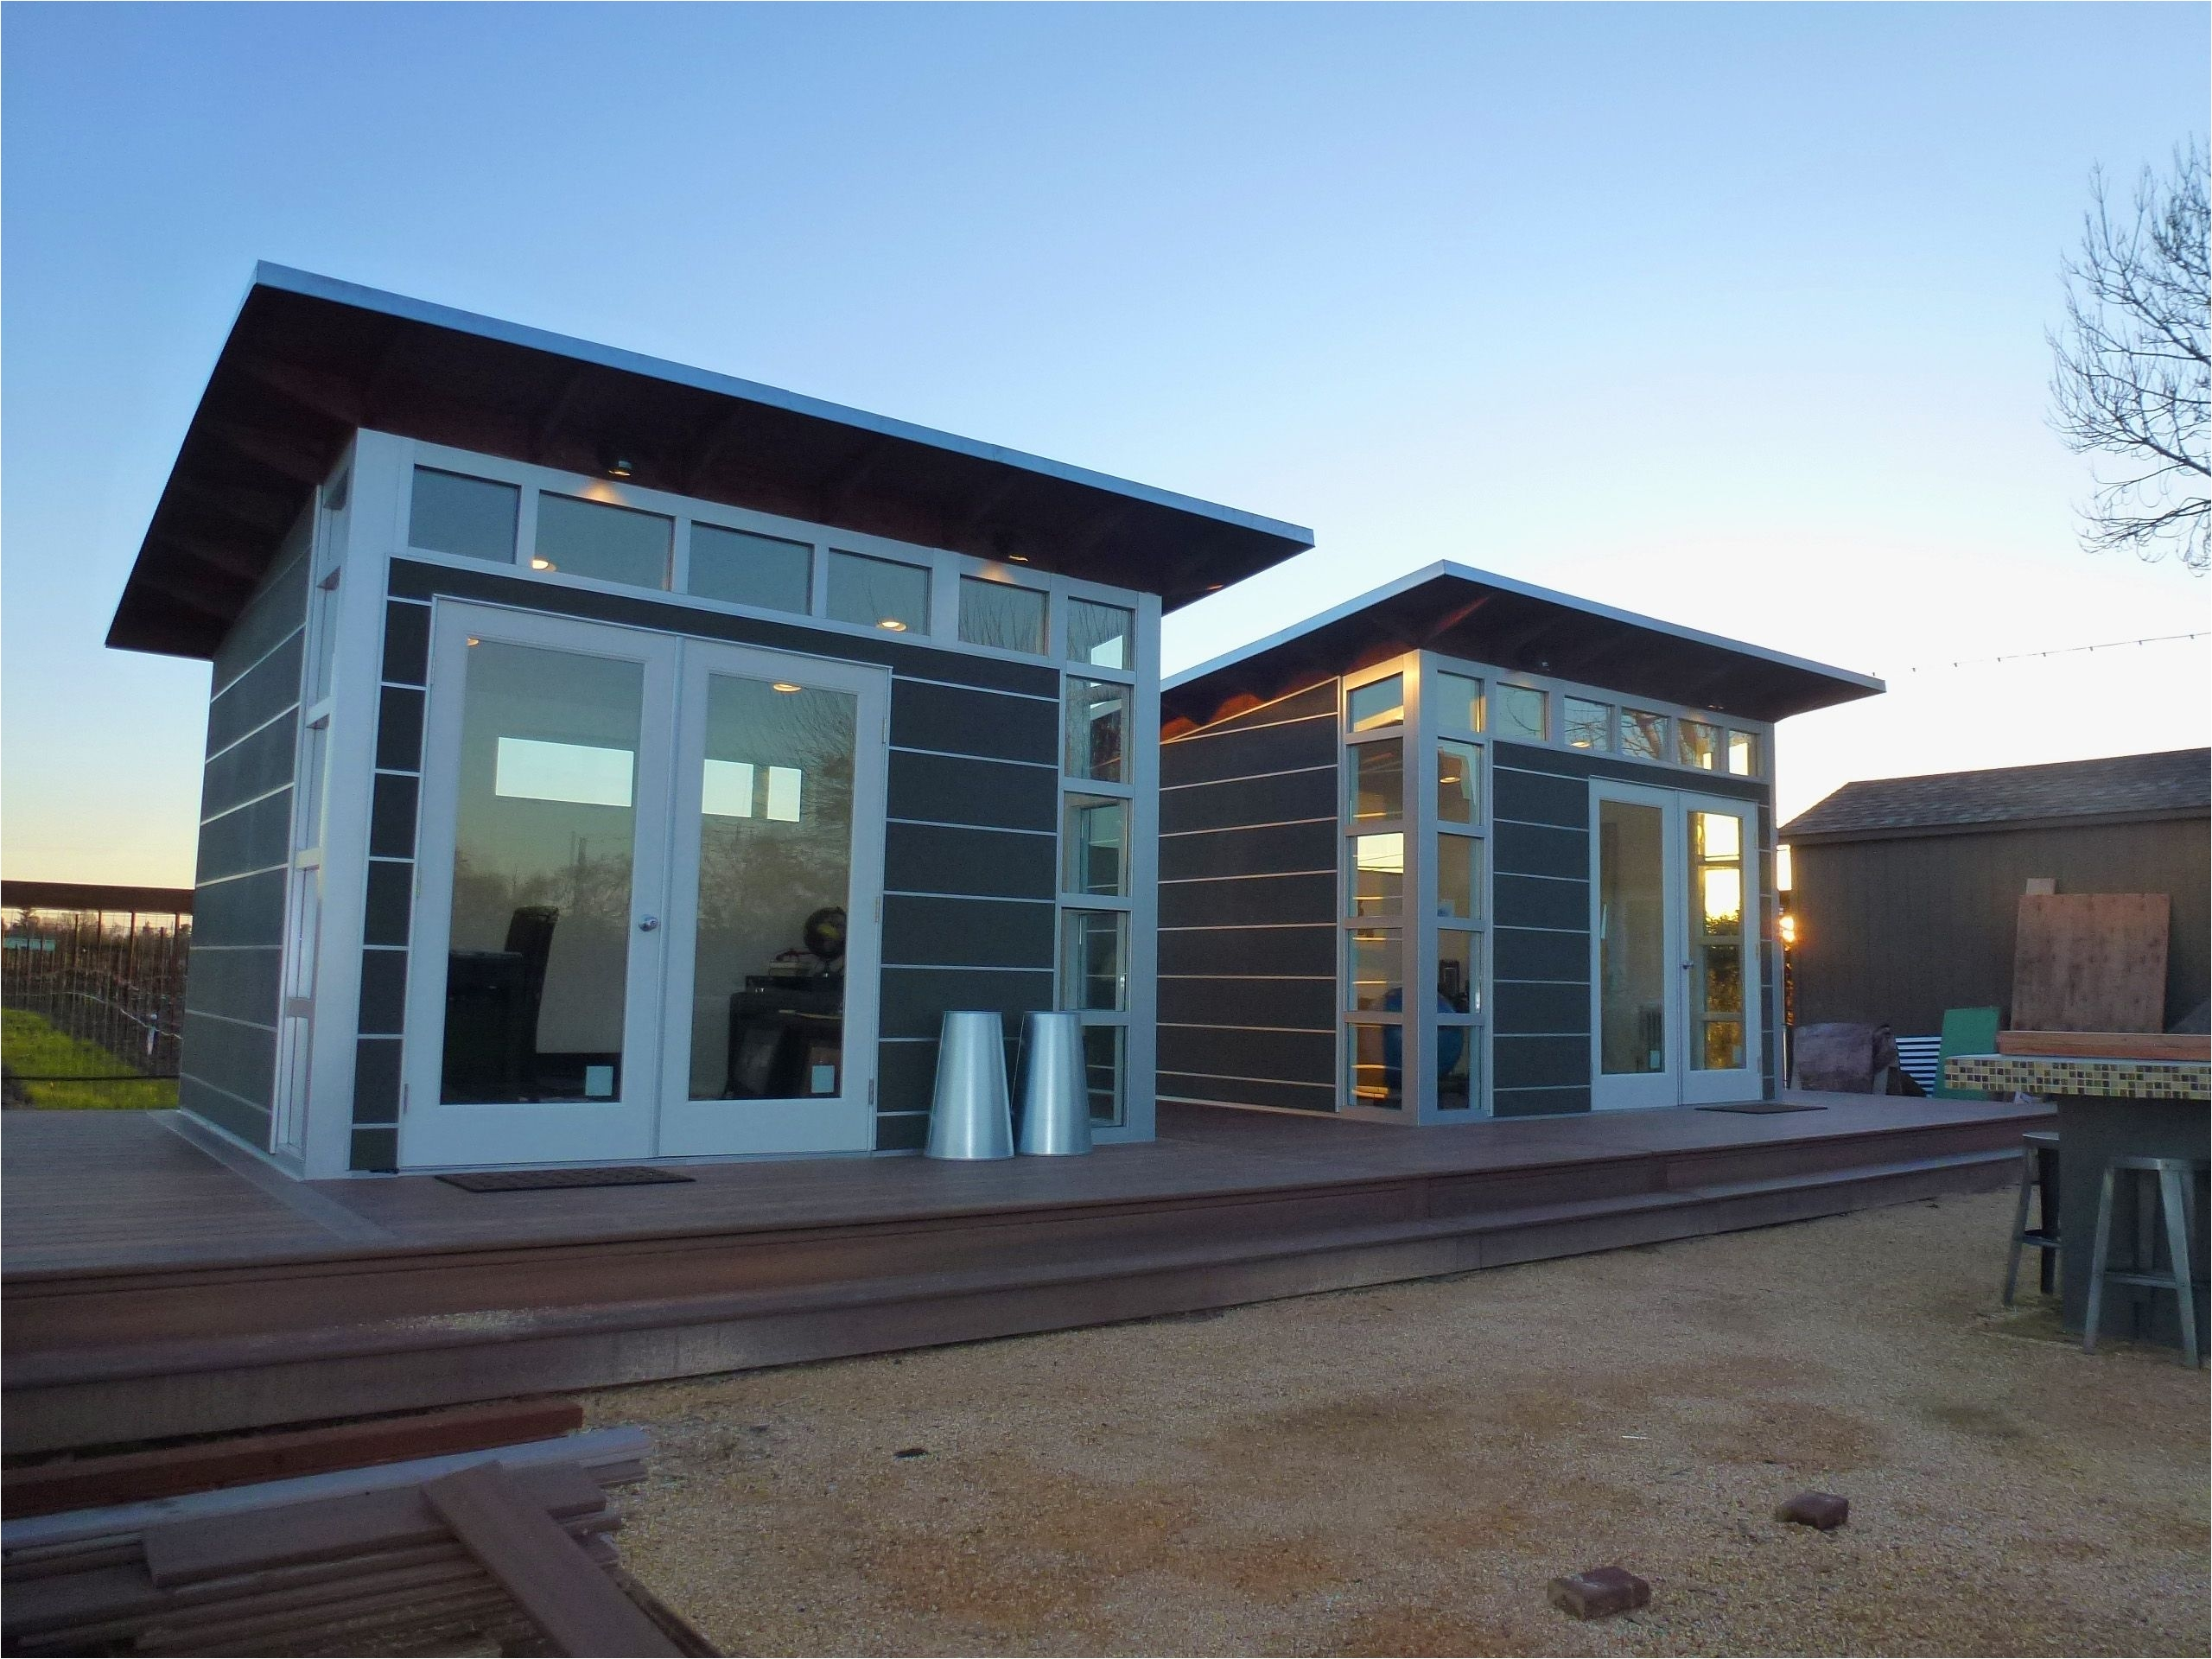 Backyard Cottage Kits Backyard Studios Home Office Sheds Reimagined Modern Prefab